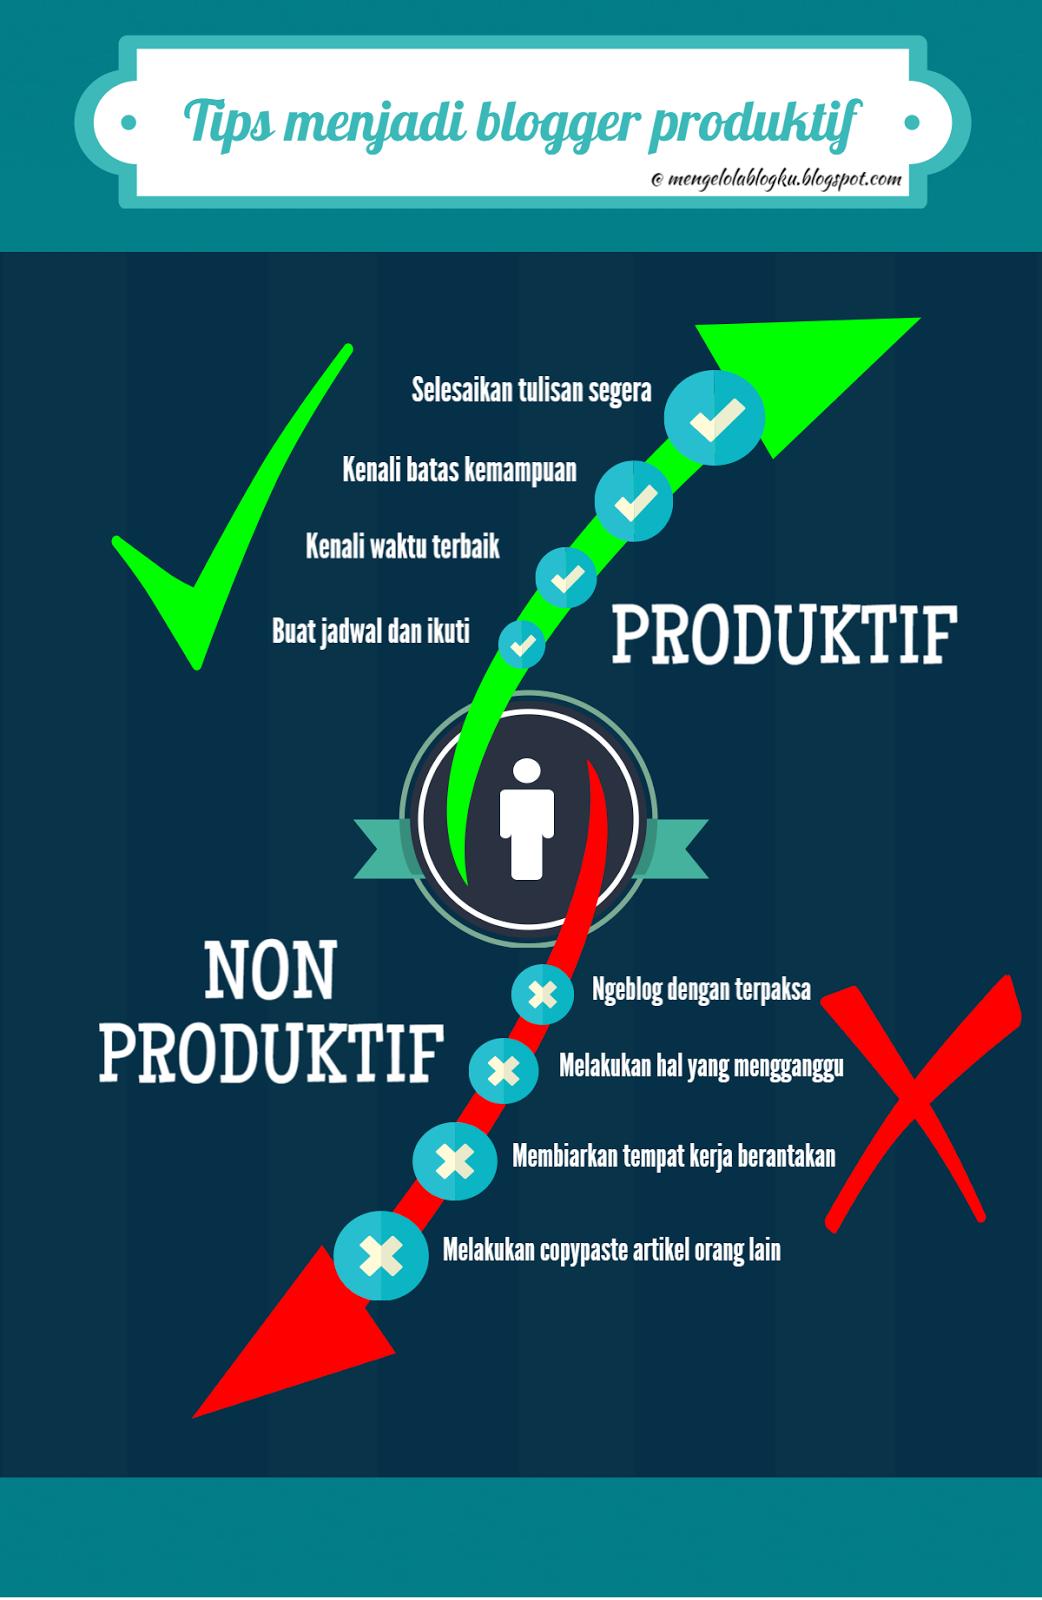 Tips-menjadi-blogger-produktif